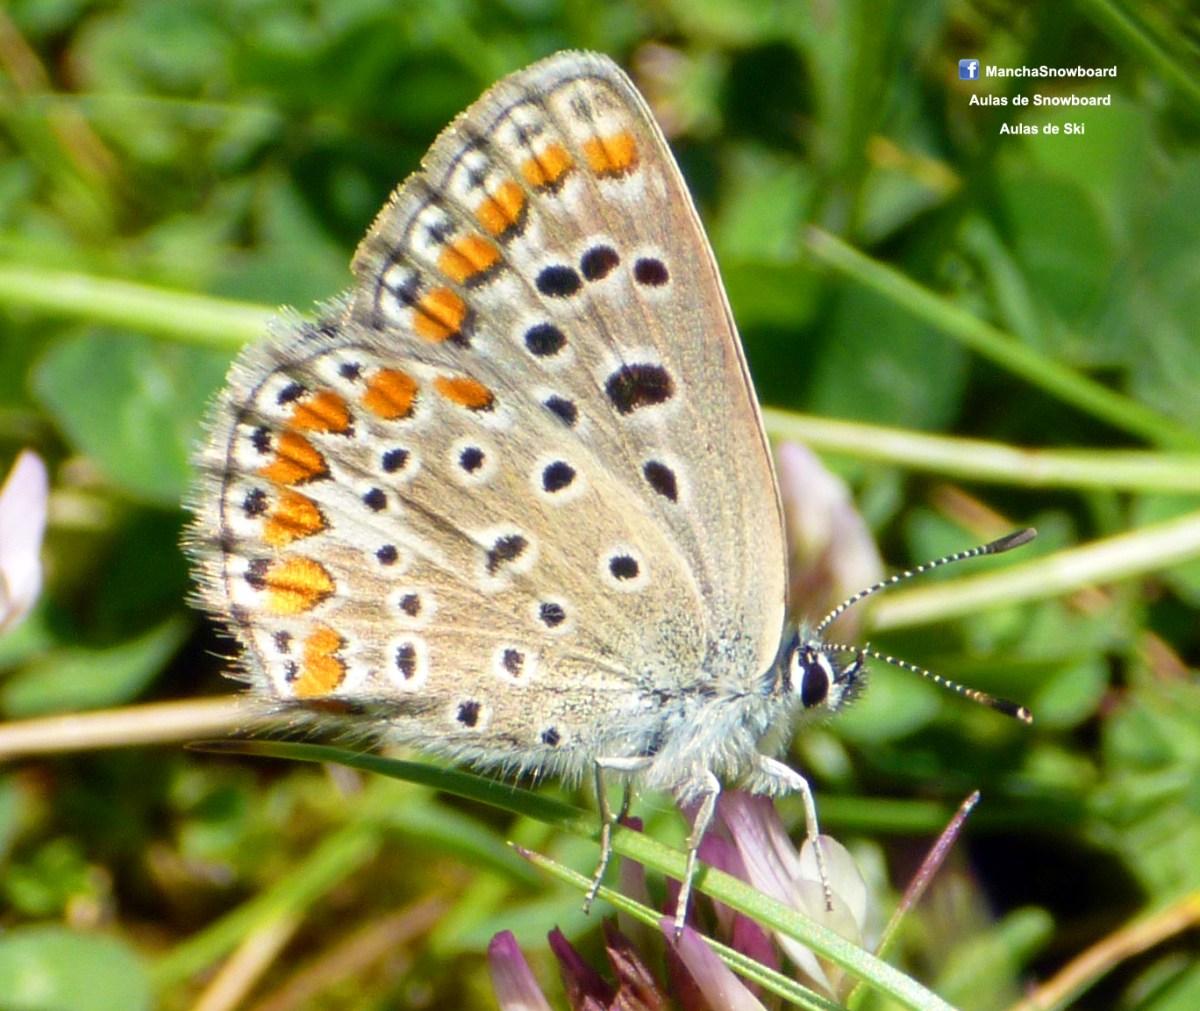 borboleta buterfly macro photo lumix penhas da saúde serra da estrela portugal